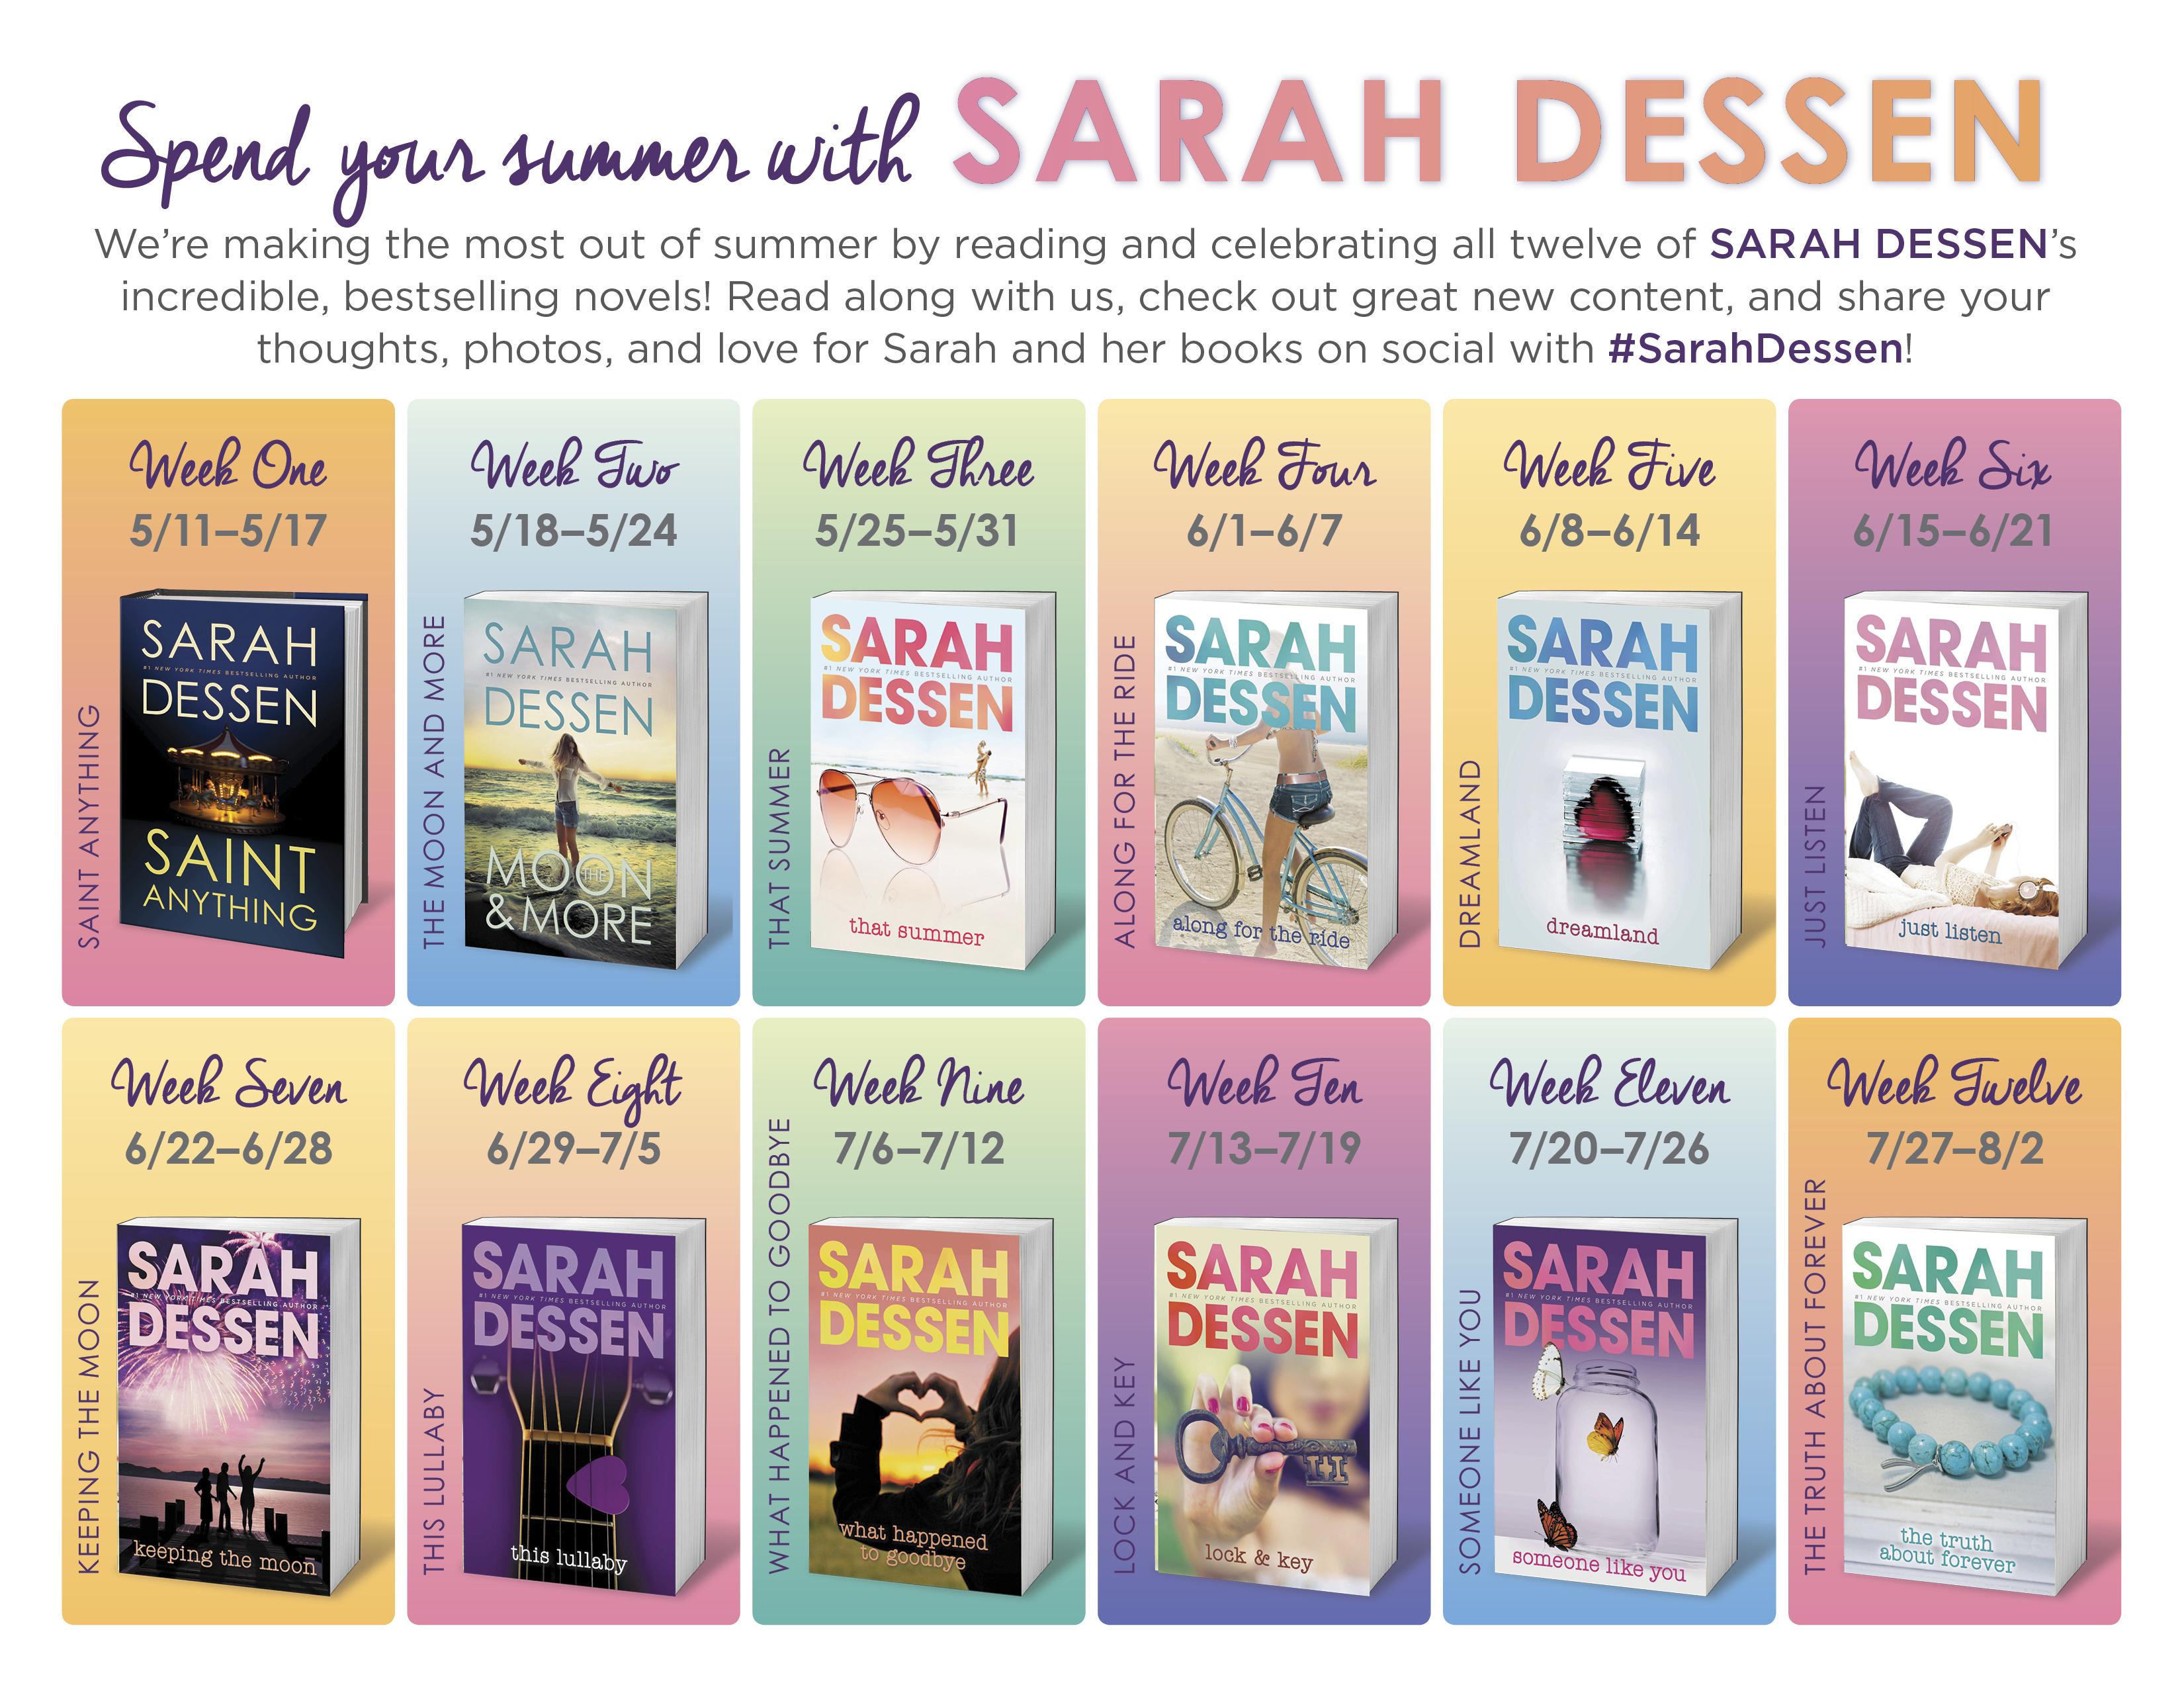 Summer_Of_Sarah_Dessen_FullCalendar